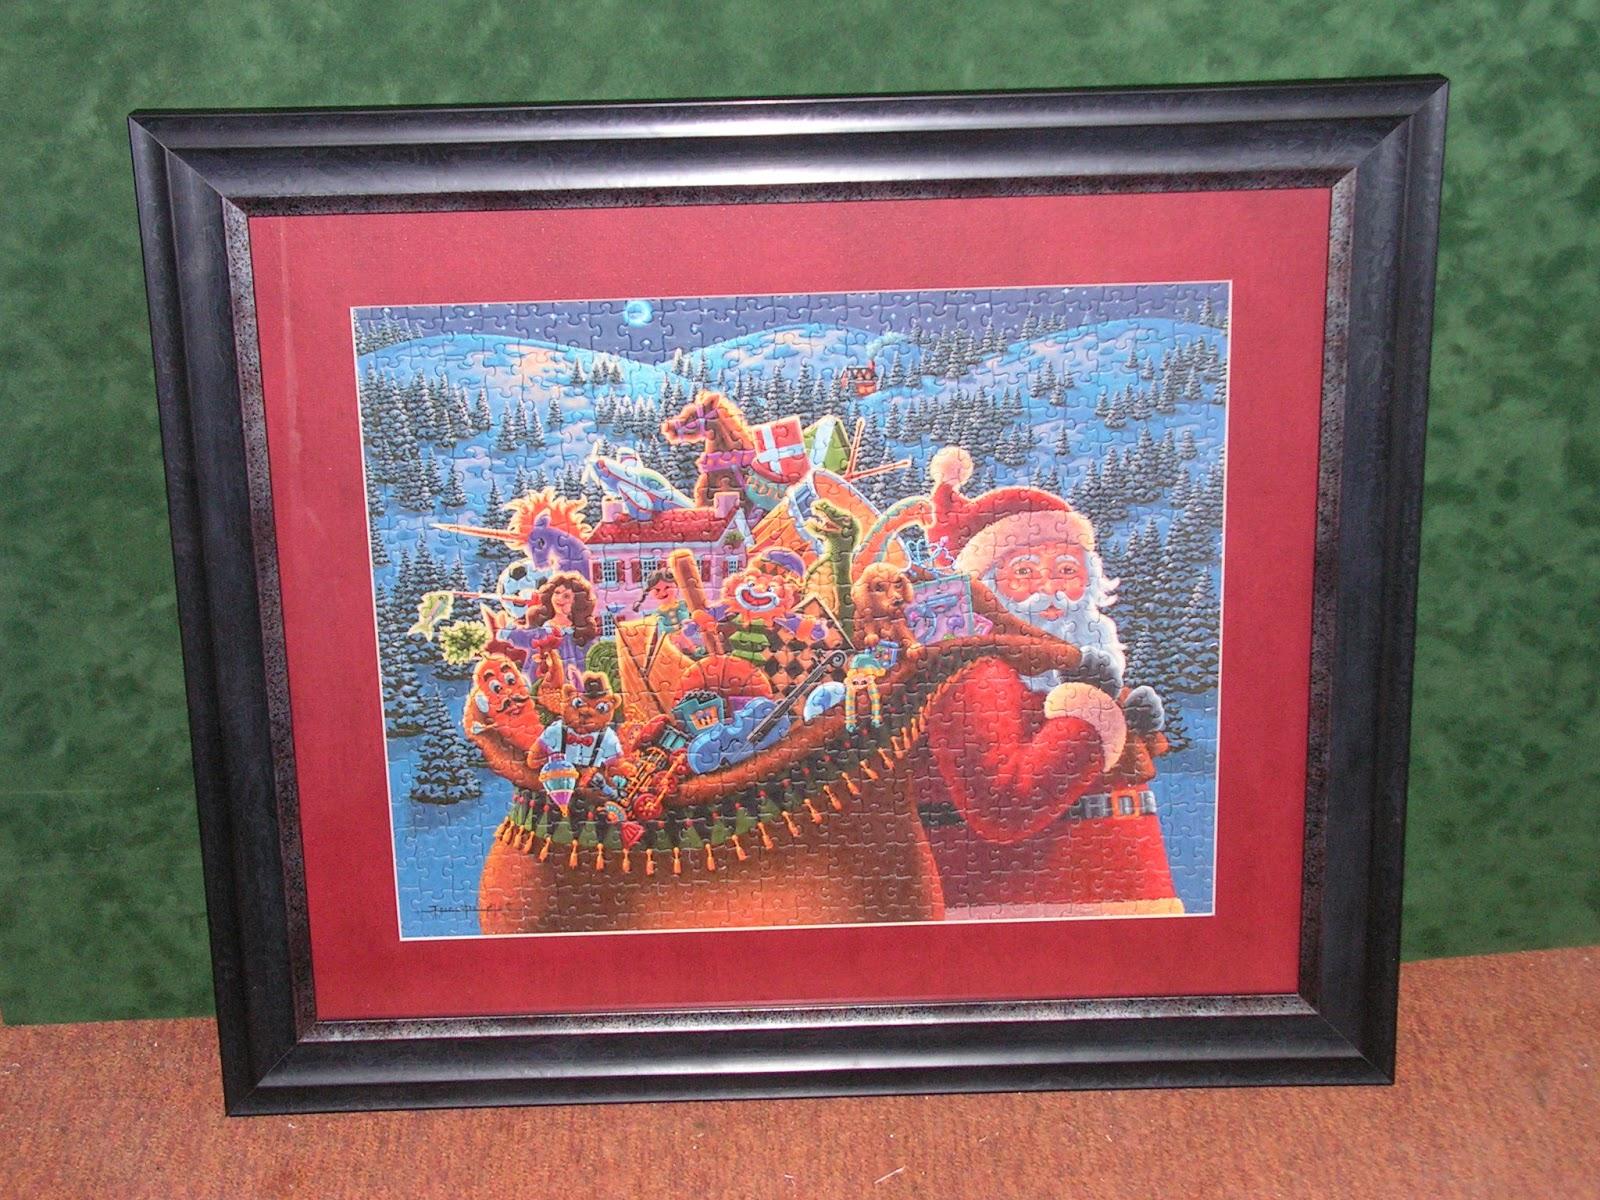 Leona\'s Framing Gallery: Framed Puzzles